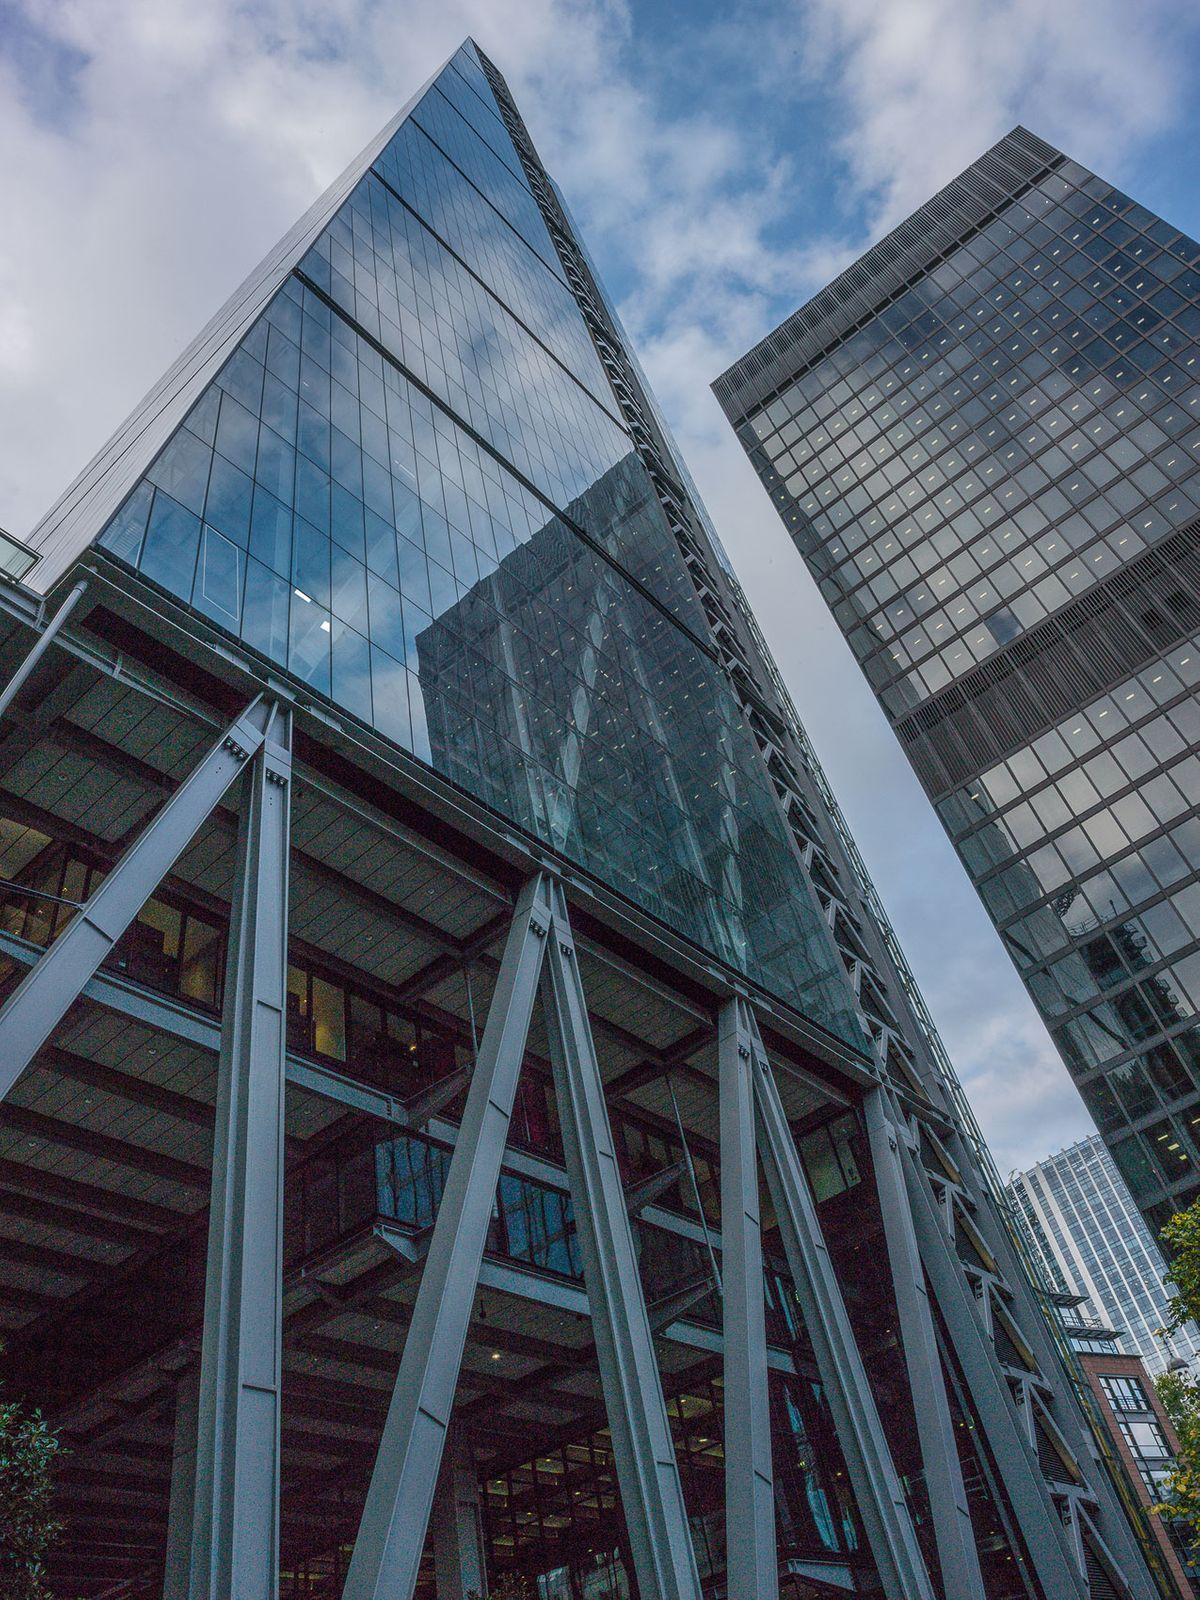 LLOYD'S BUILDING, STUDY 1, LONDON, ENGLAND, 2017